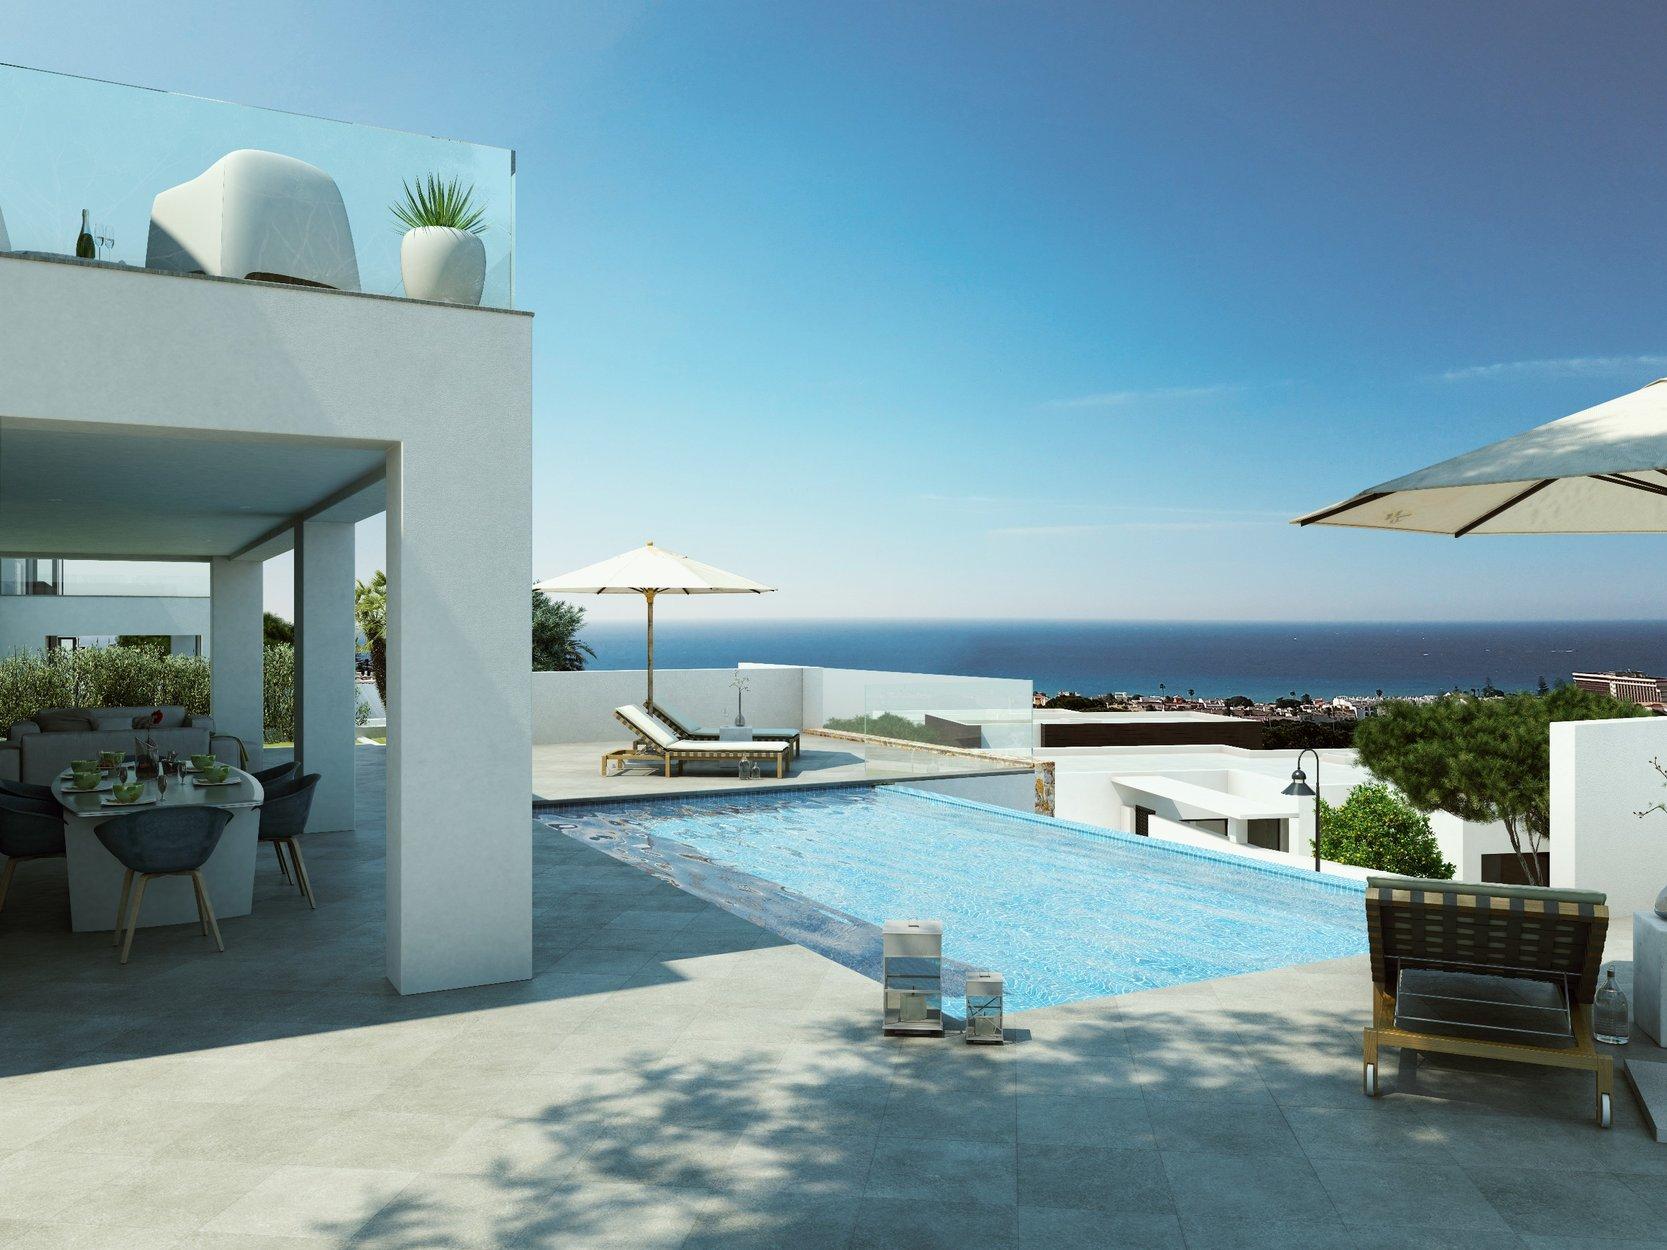 Villa till salu i Mijas, La Cala Views